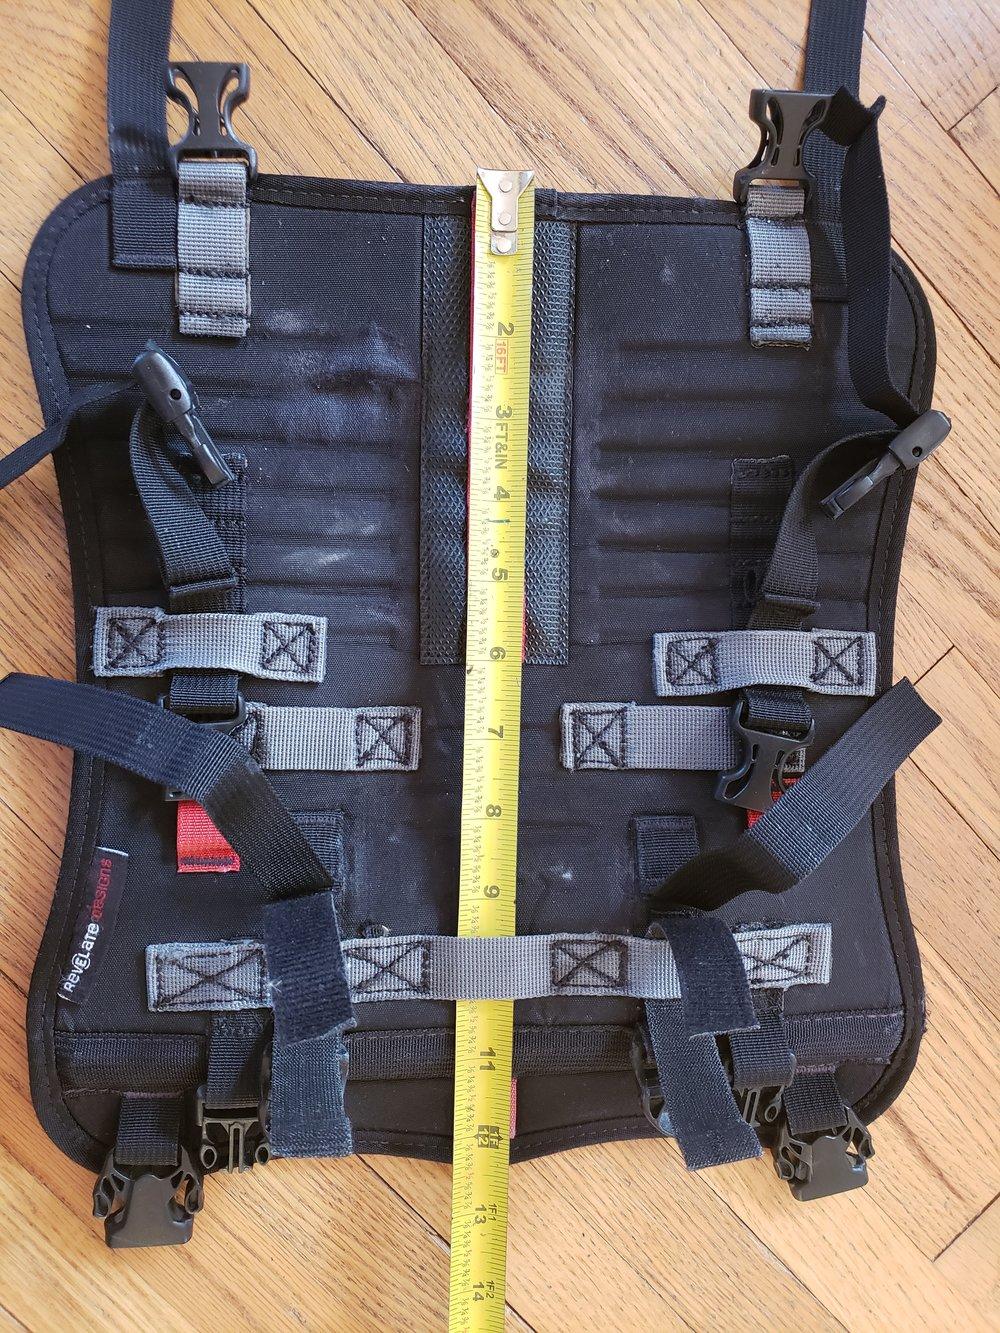 Revelate Design Harness & BarYak Expedition